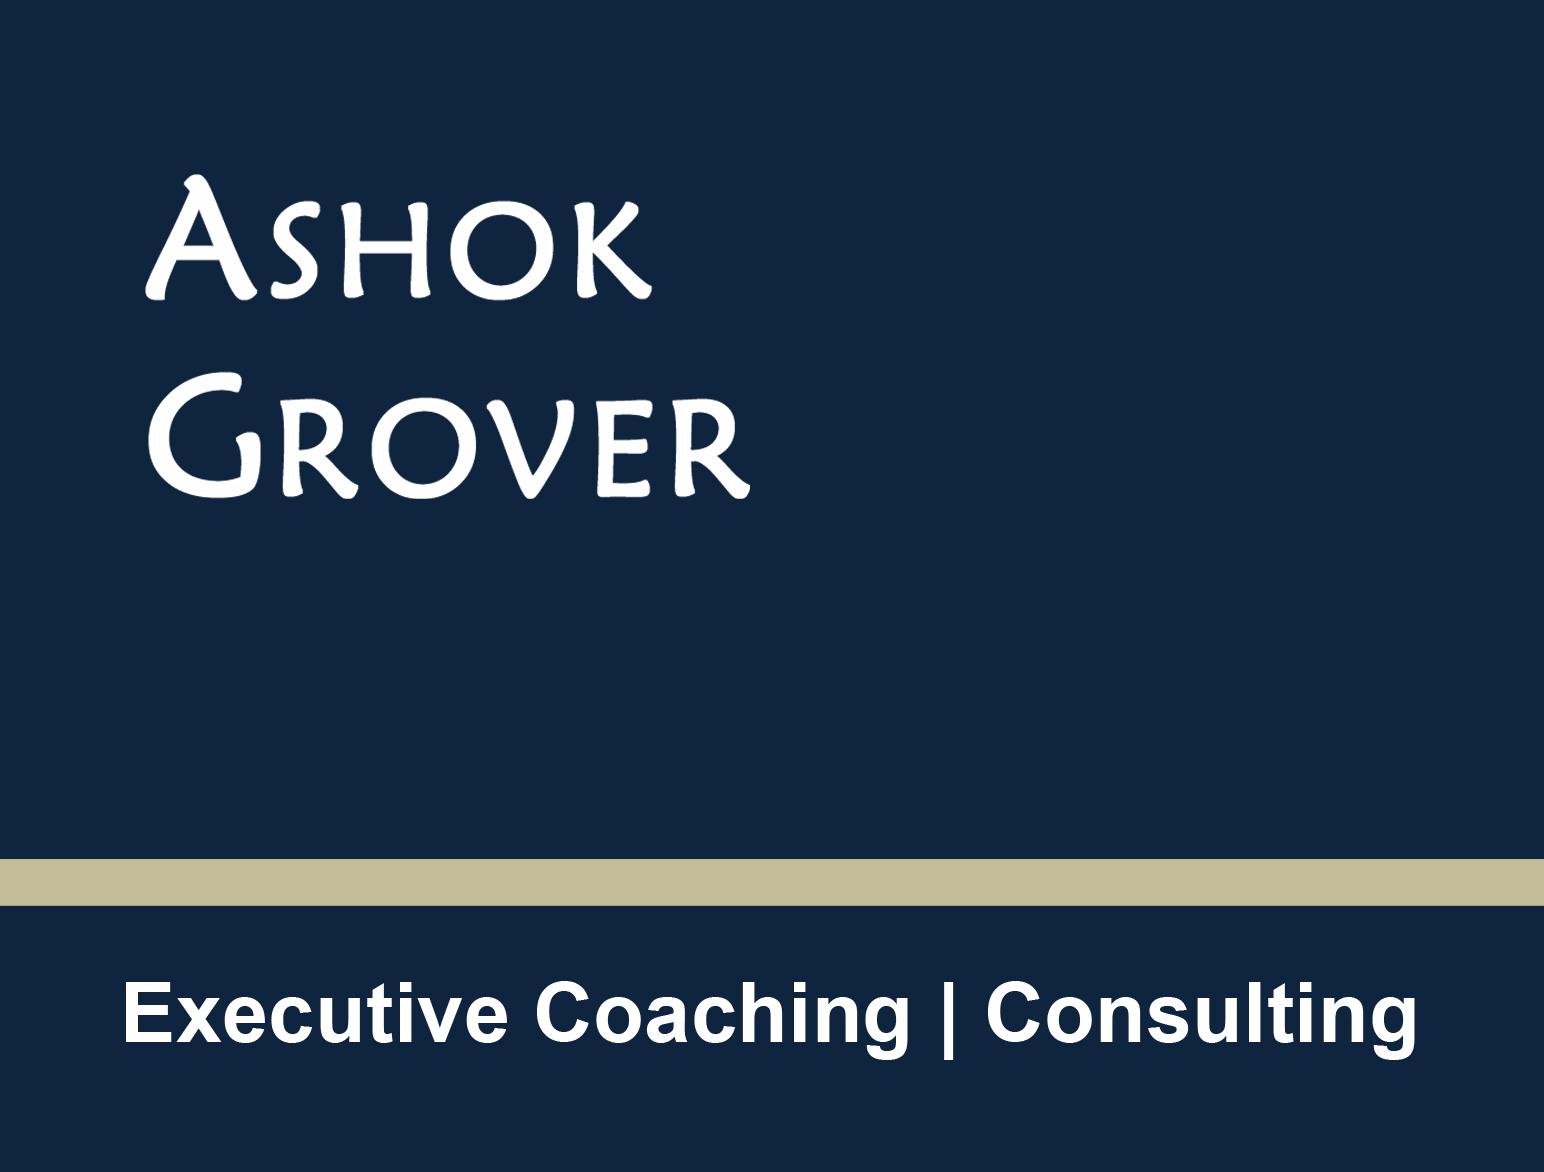 Ashok Grover Consulting